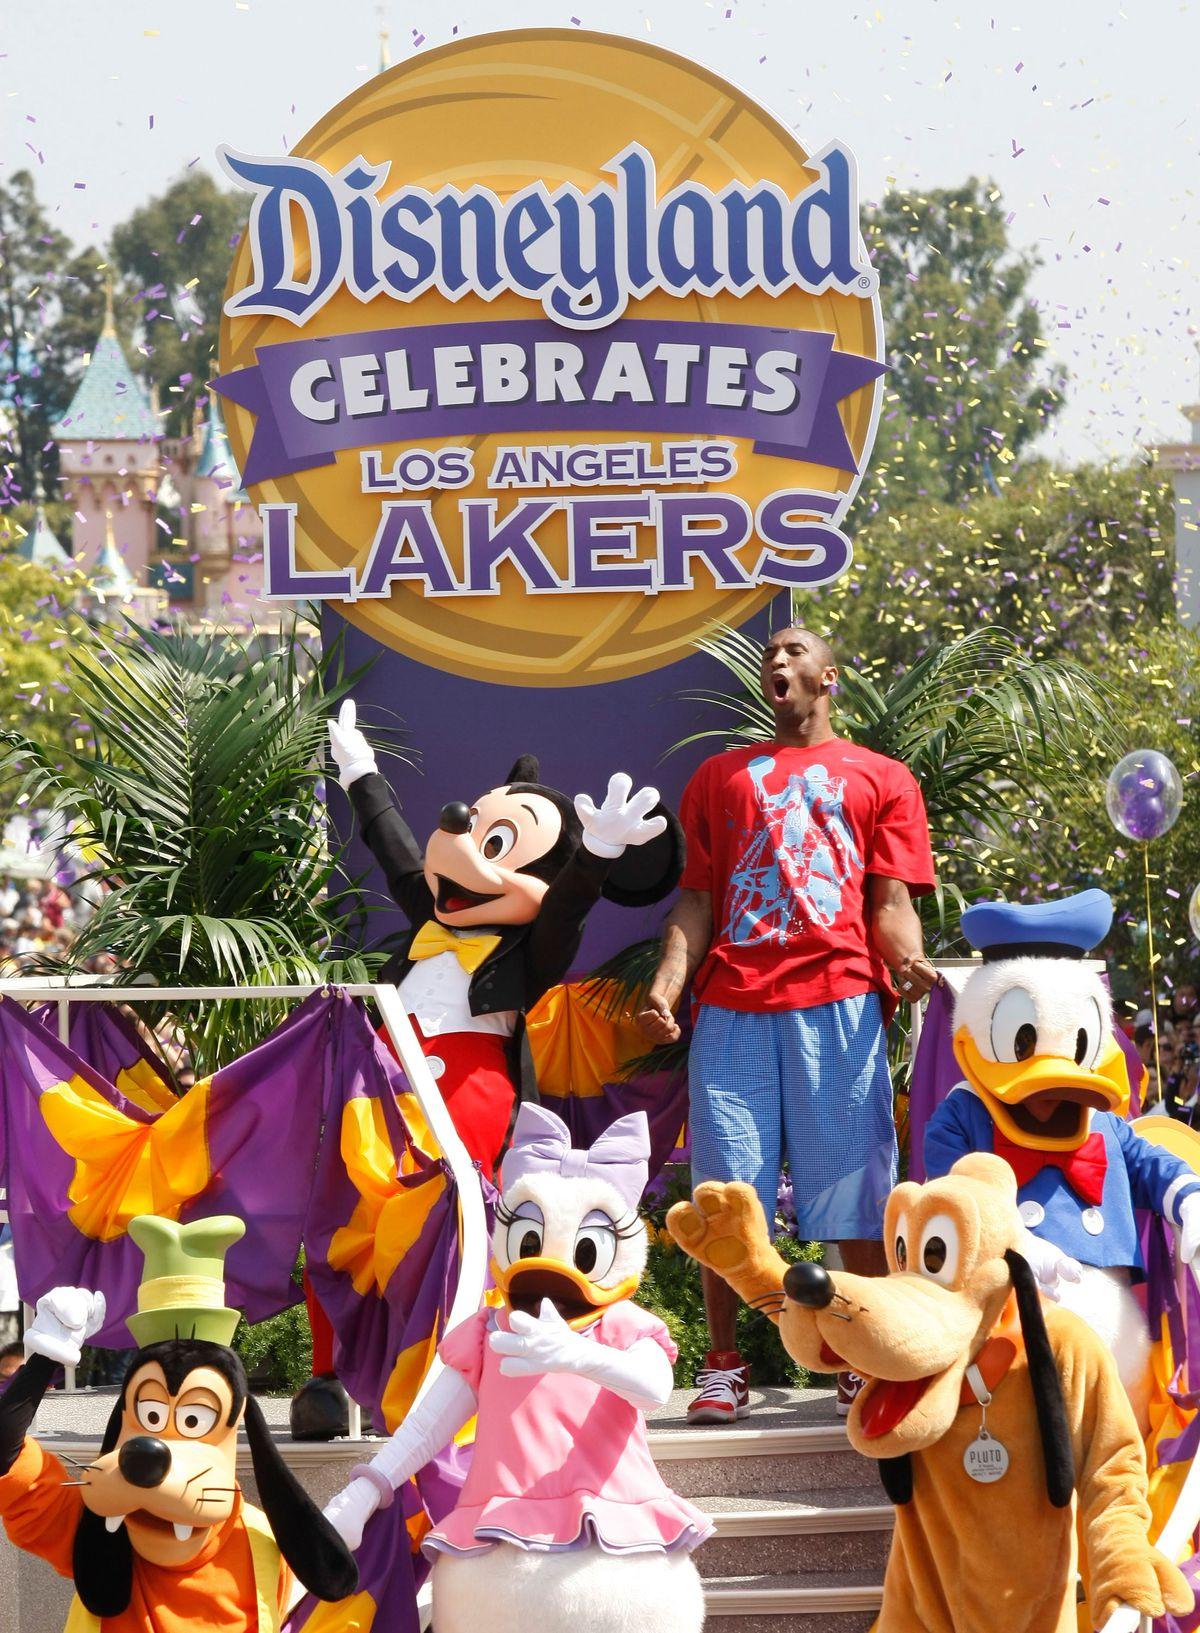 2009 NBA Finals MVP Kobe Bryant Celebrates At Disneyland